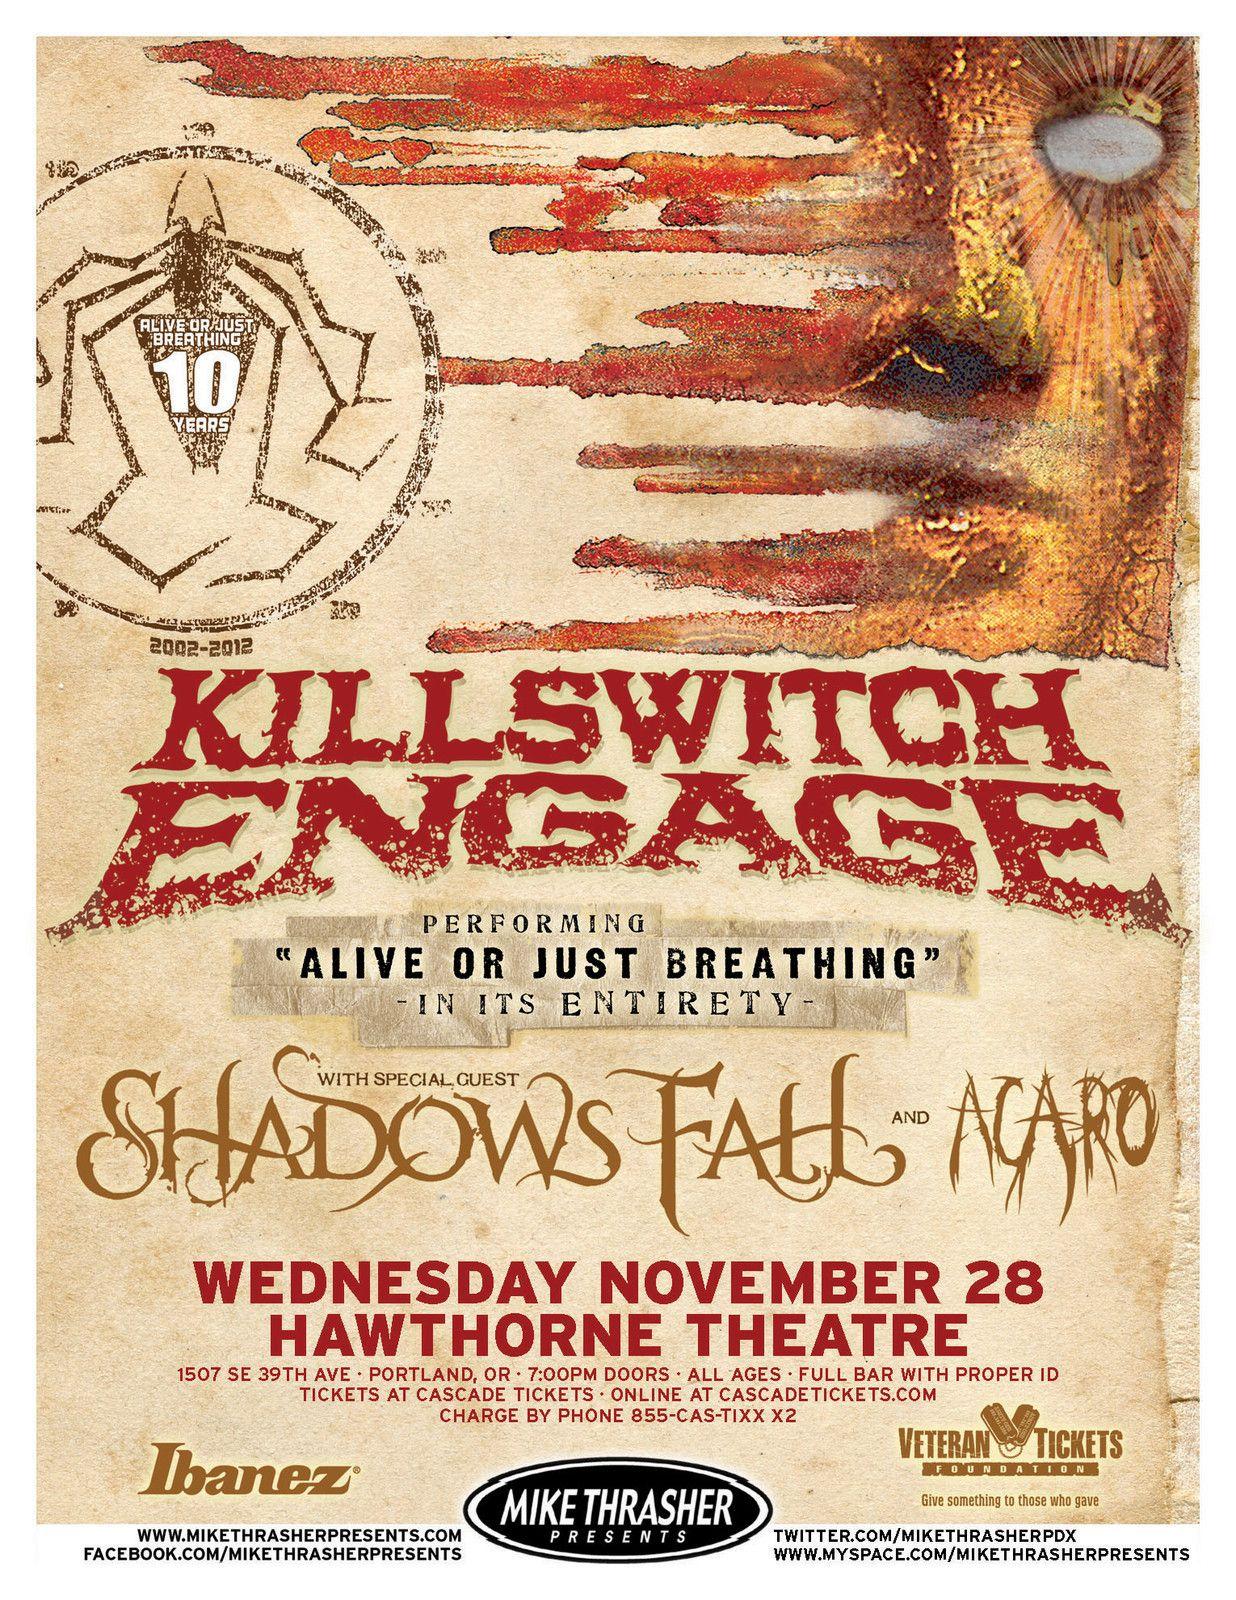 Metal Concert Posters Engage Shadows Fall 2012 Portland